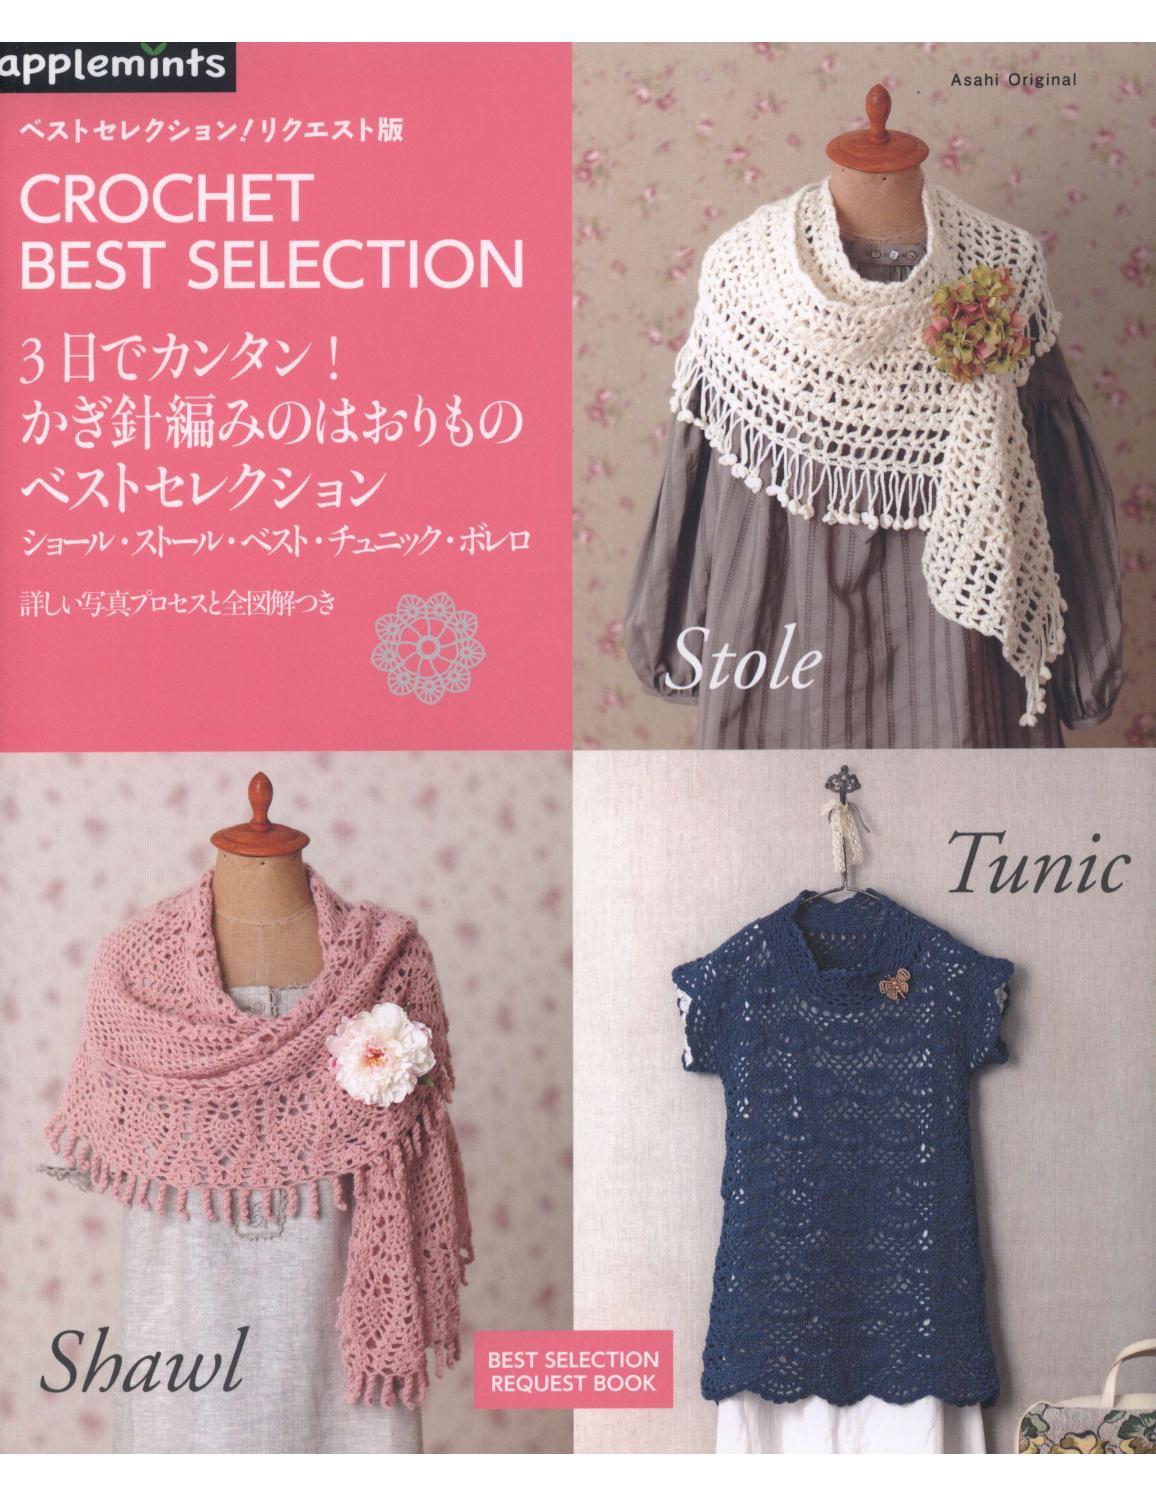 Asahi original crochet best selection 2012 page 1